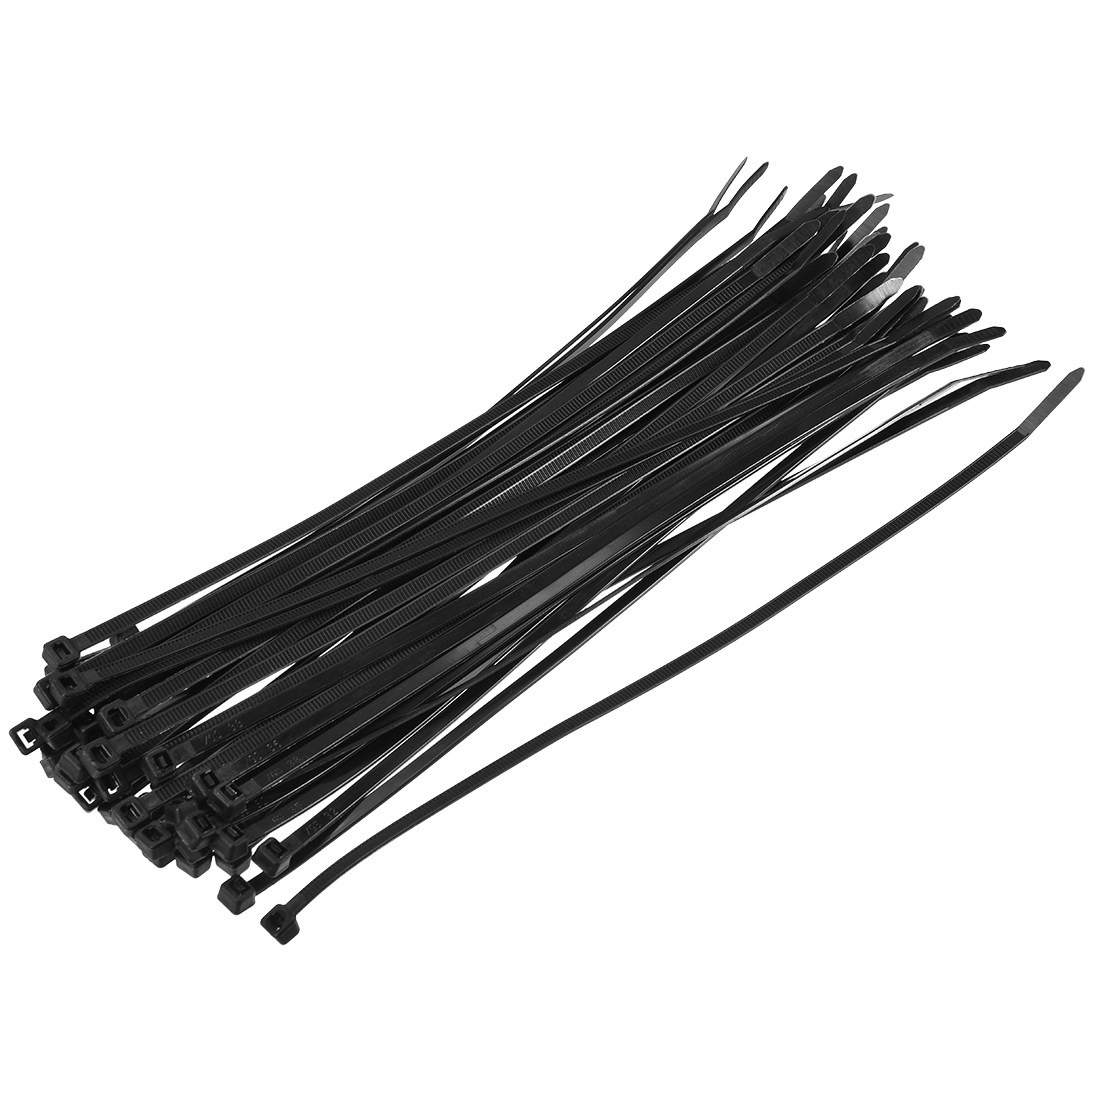 Cable Zip Ties 250mmx5.2mm Self-Locking Nylon Tie Wraps Black 150pcs